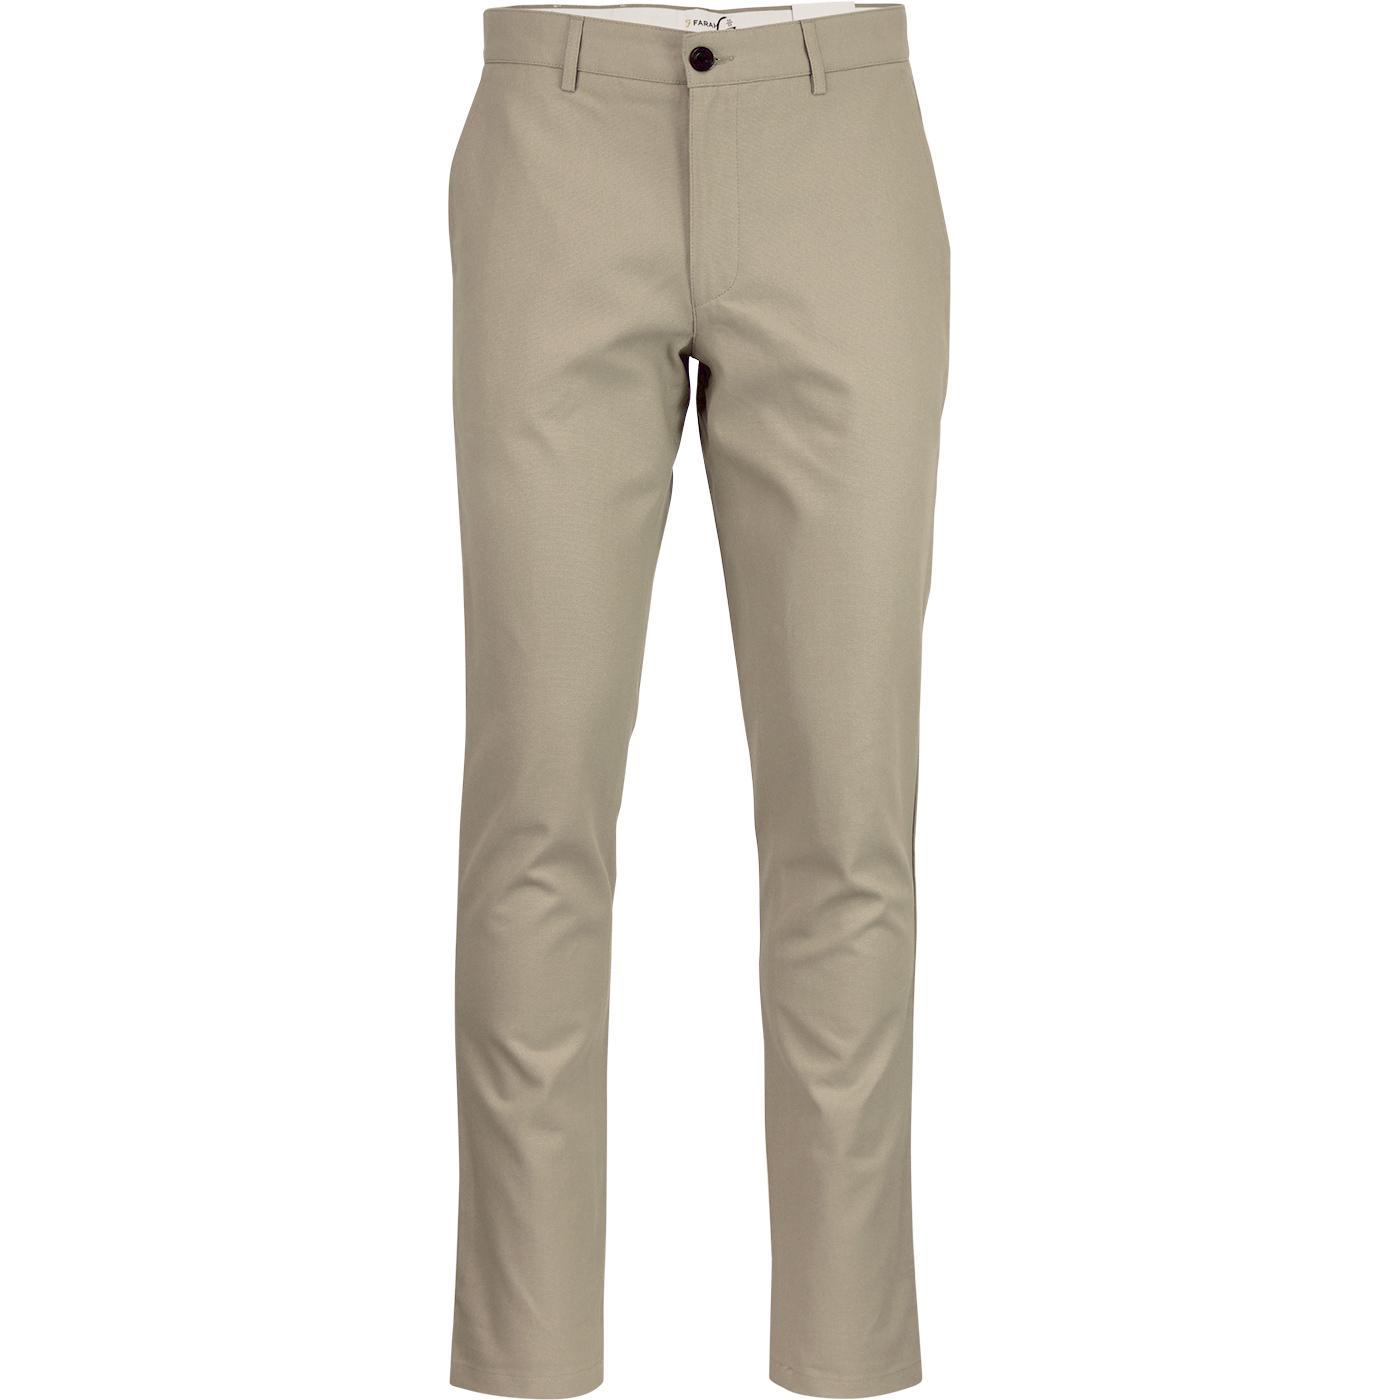 Elm FARAH 60s Mod Slim Hopsack Trousers SANDSTONE